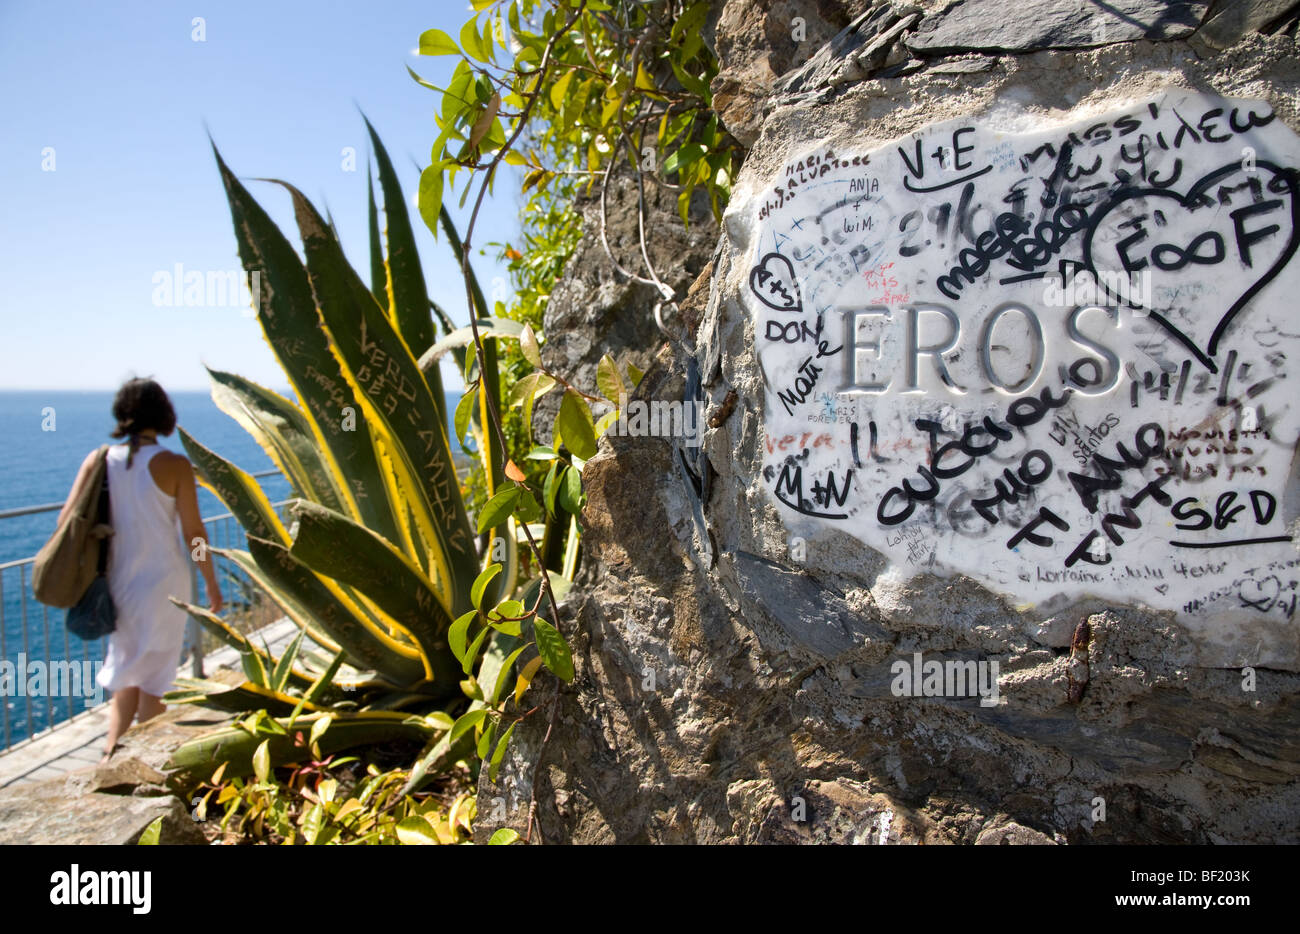 Eros plaque on the Via dell'Amore Path of Love, Cinque Terre, Liguria, Italy - Stock Image